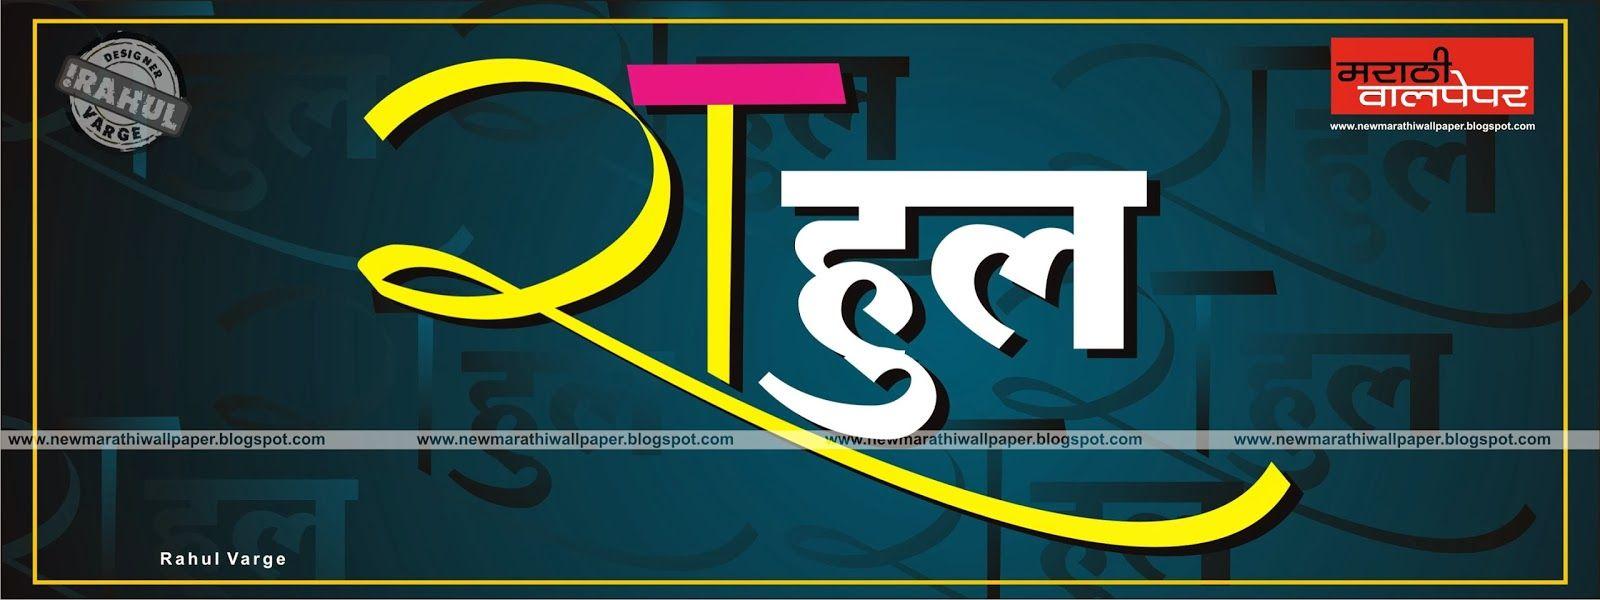 Good Wallpaper Name Rahul - ae5b1d72c8523c9200edb304477a0eda  Photograph_1008961.jpg